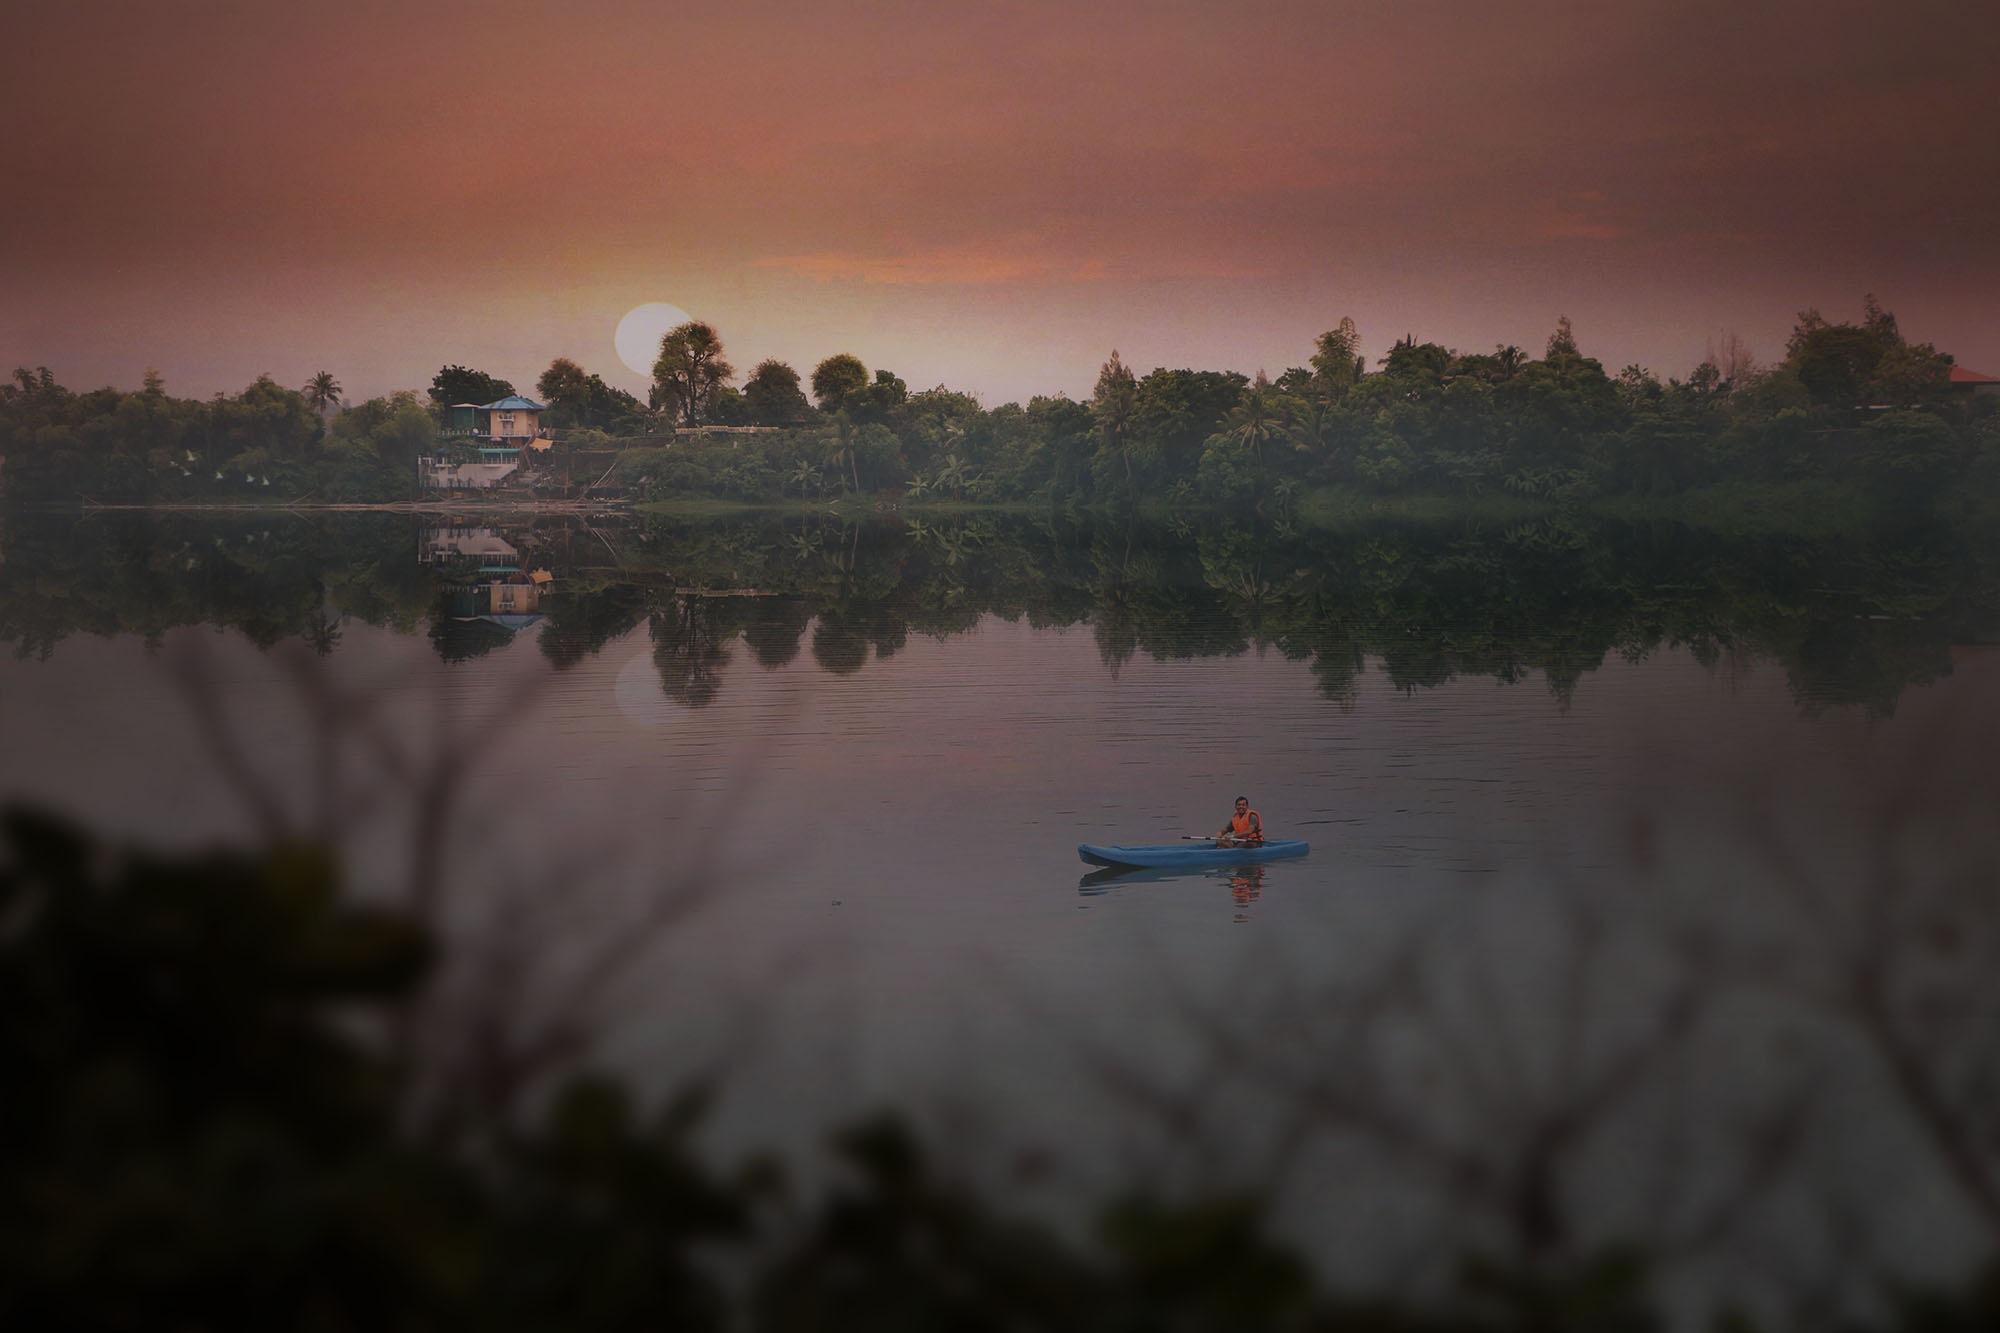 Kayaking in the Sunrise by Bernard Miranda